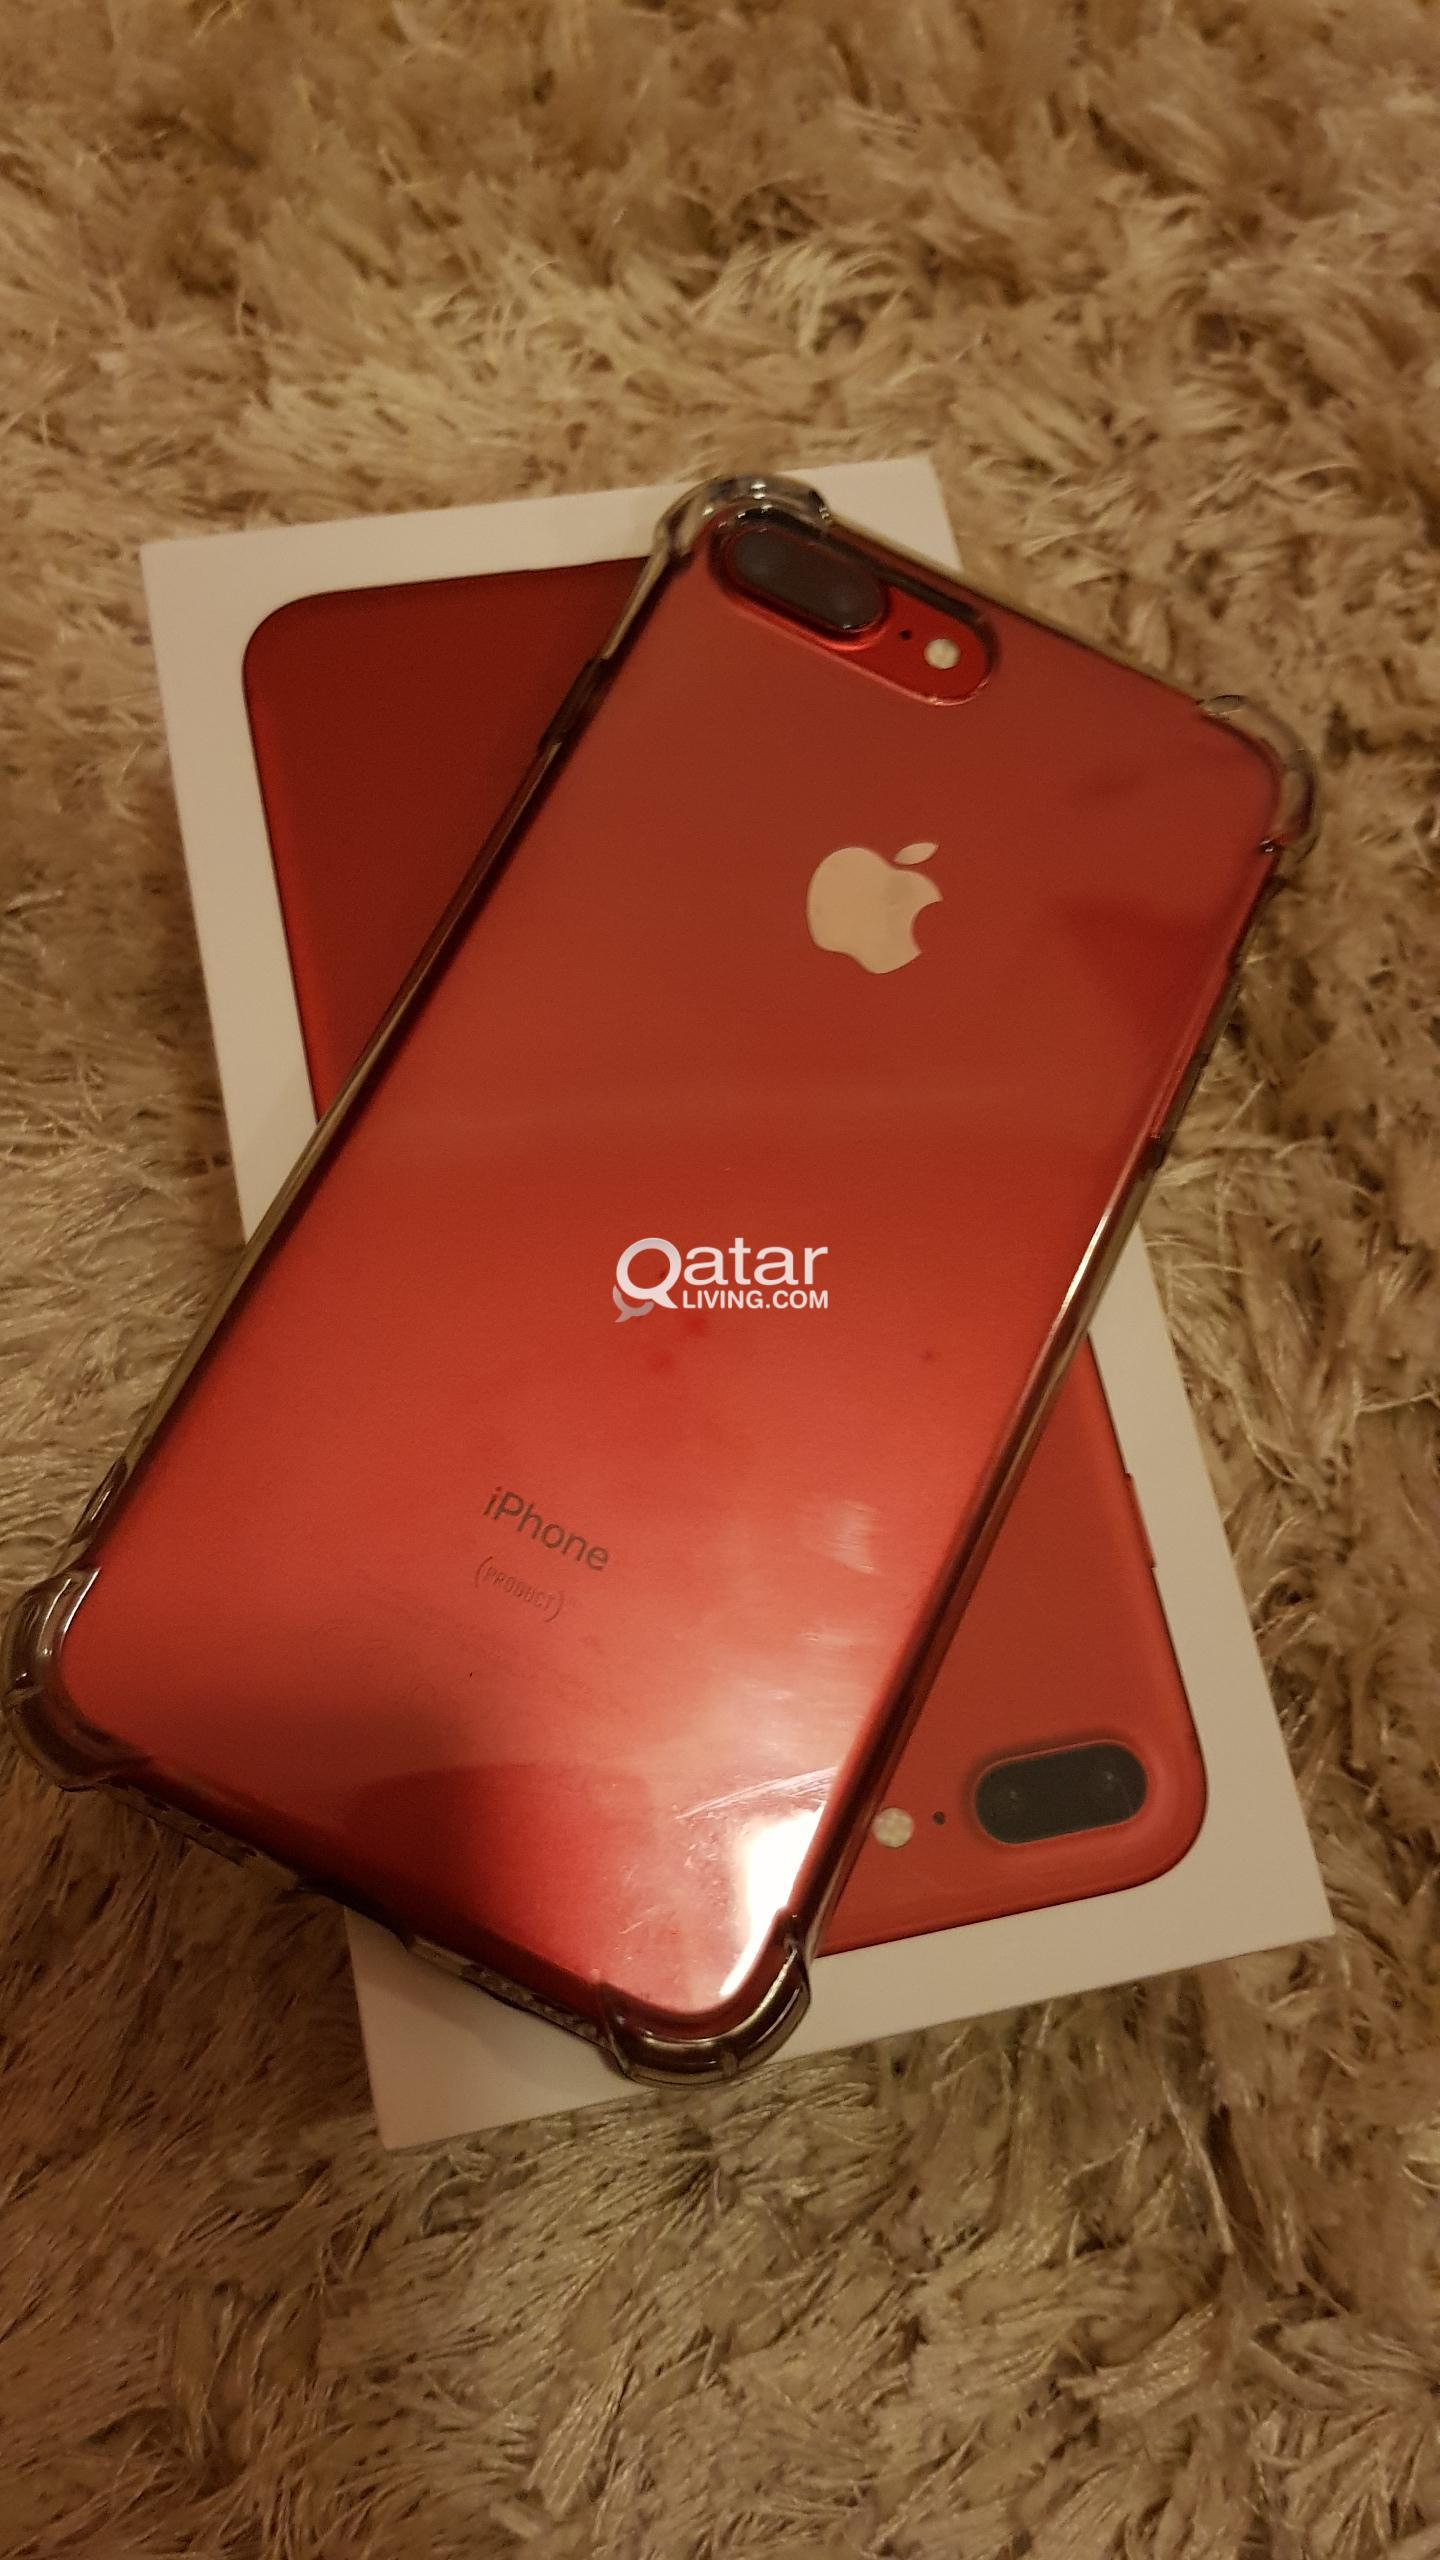 Iphone 7 plus 128GB Red | Qatar Living